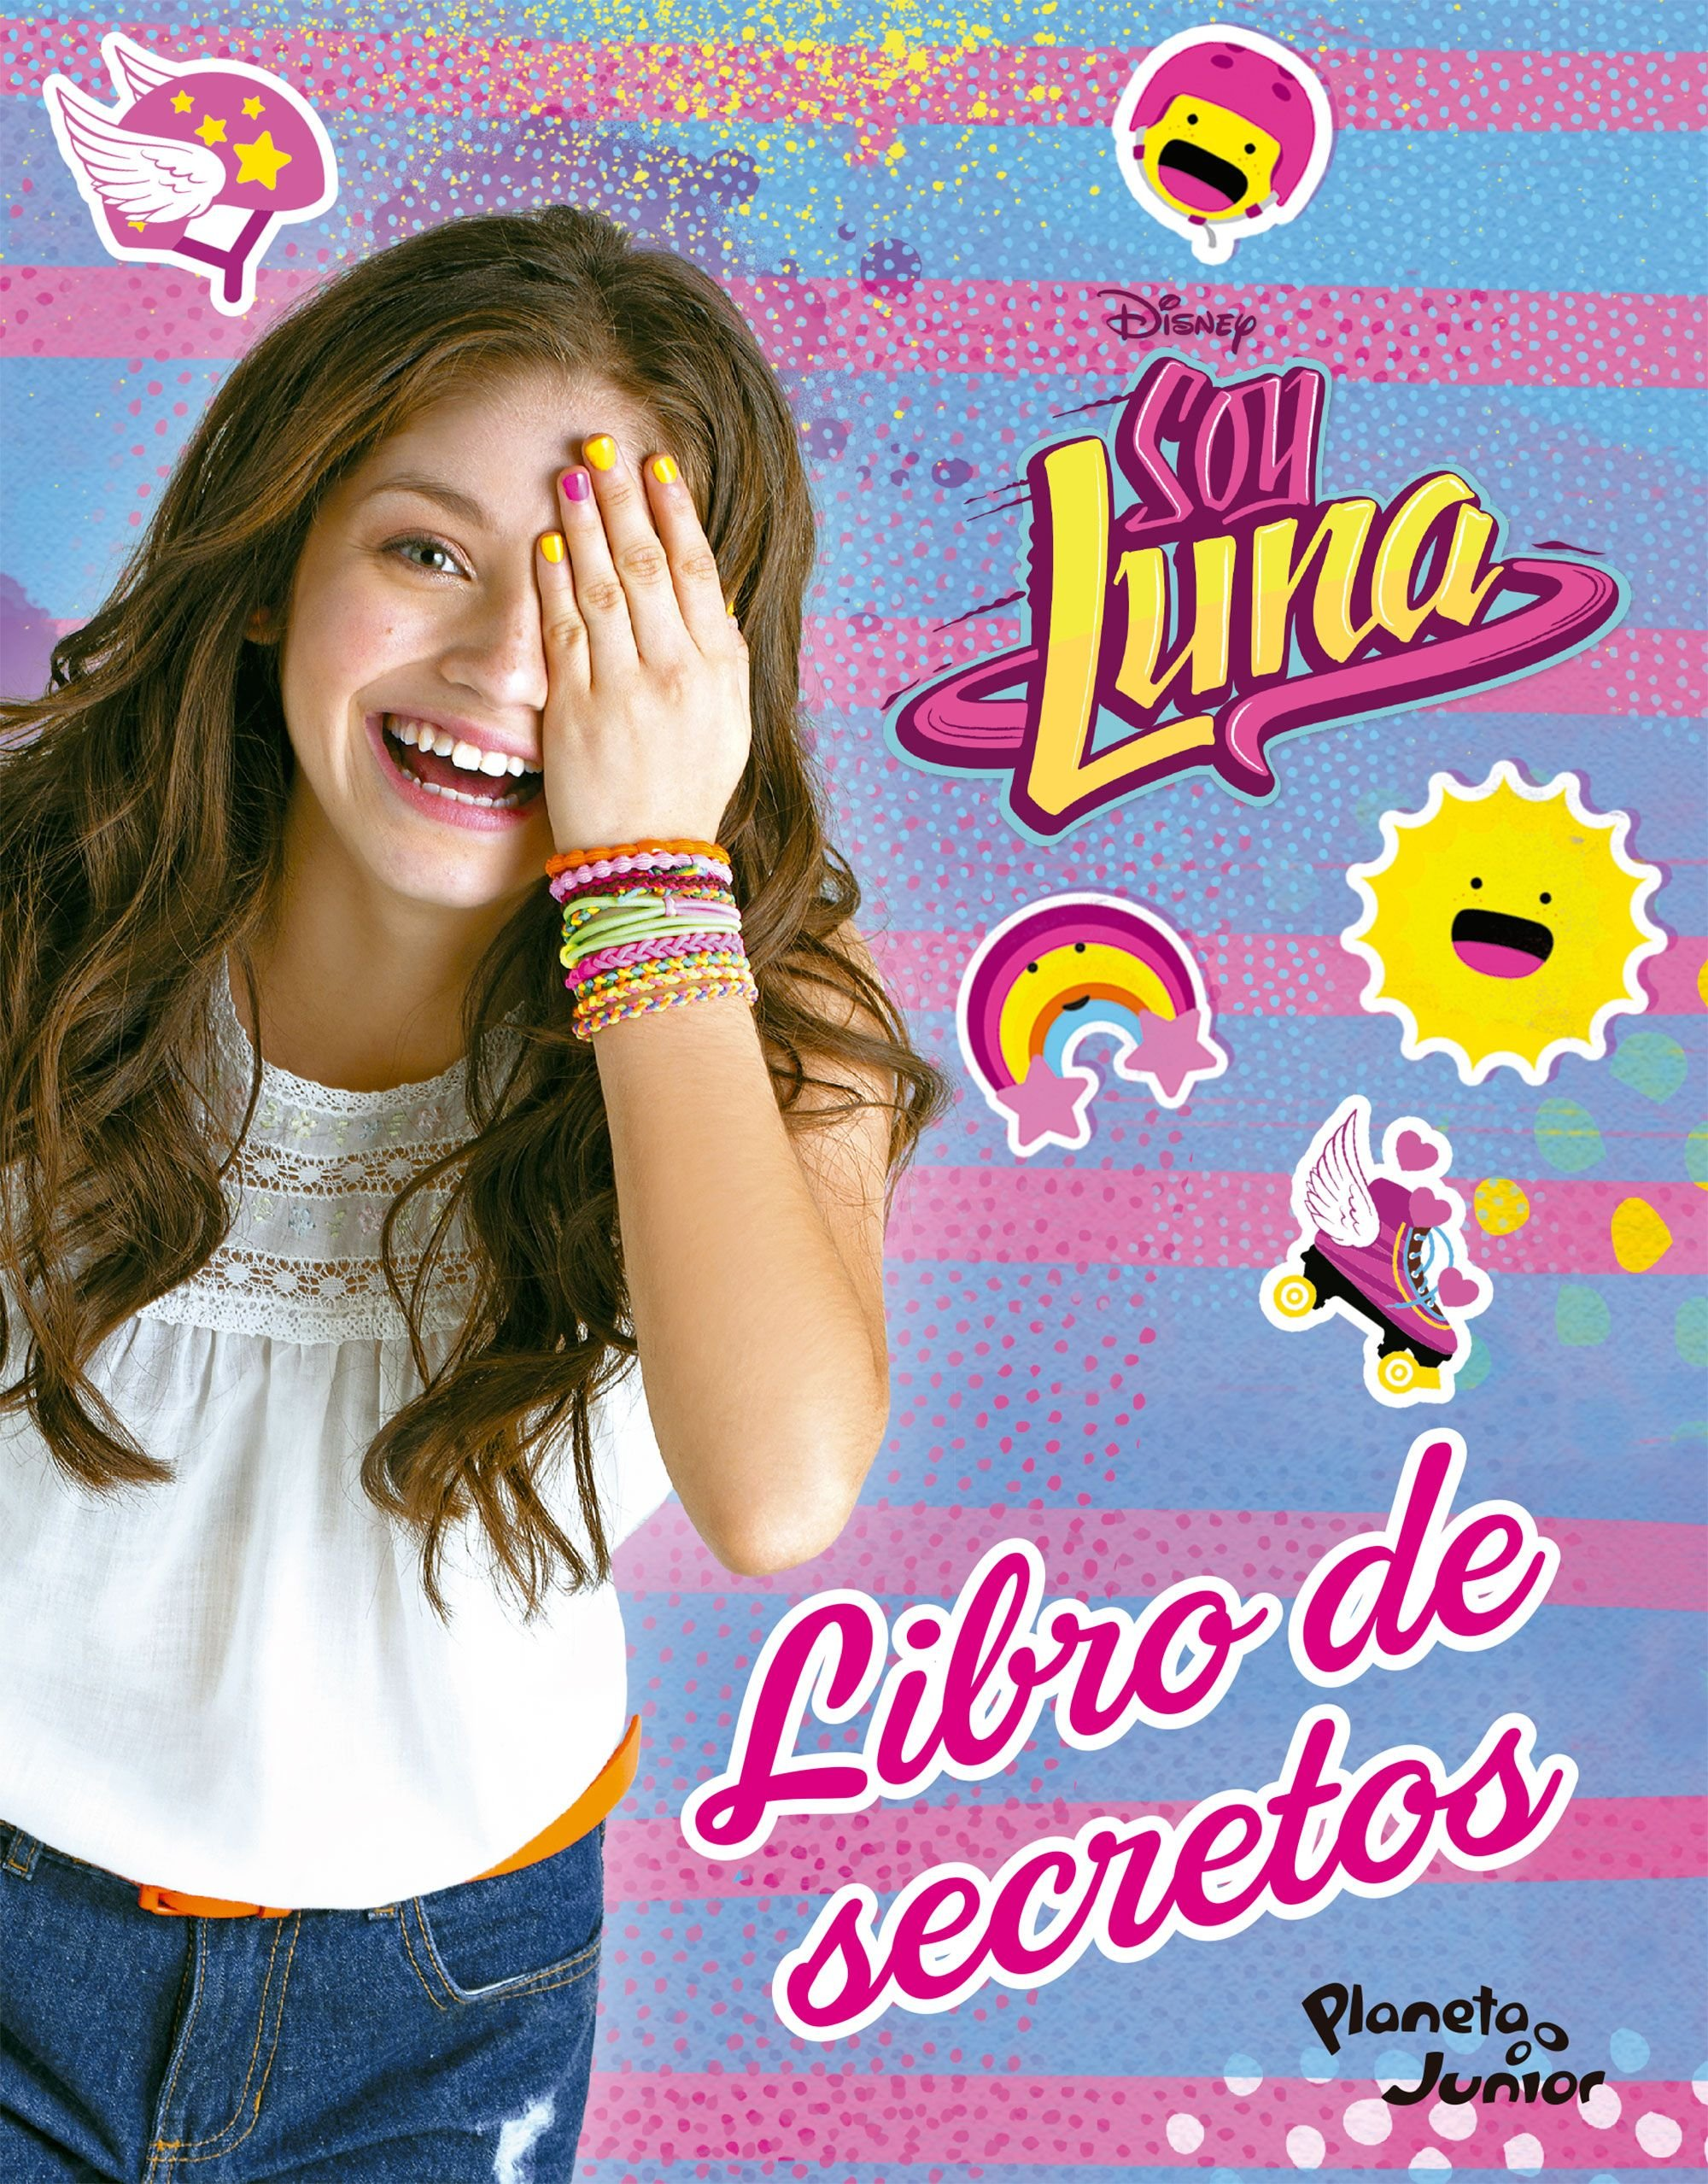 Soy luna. Libro de secretos (Spanish) Paperback – 2013